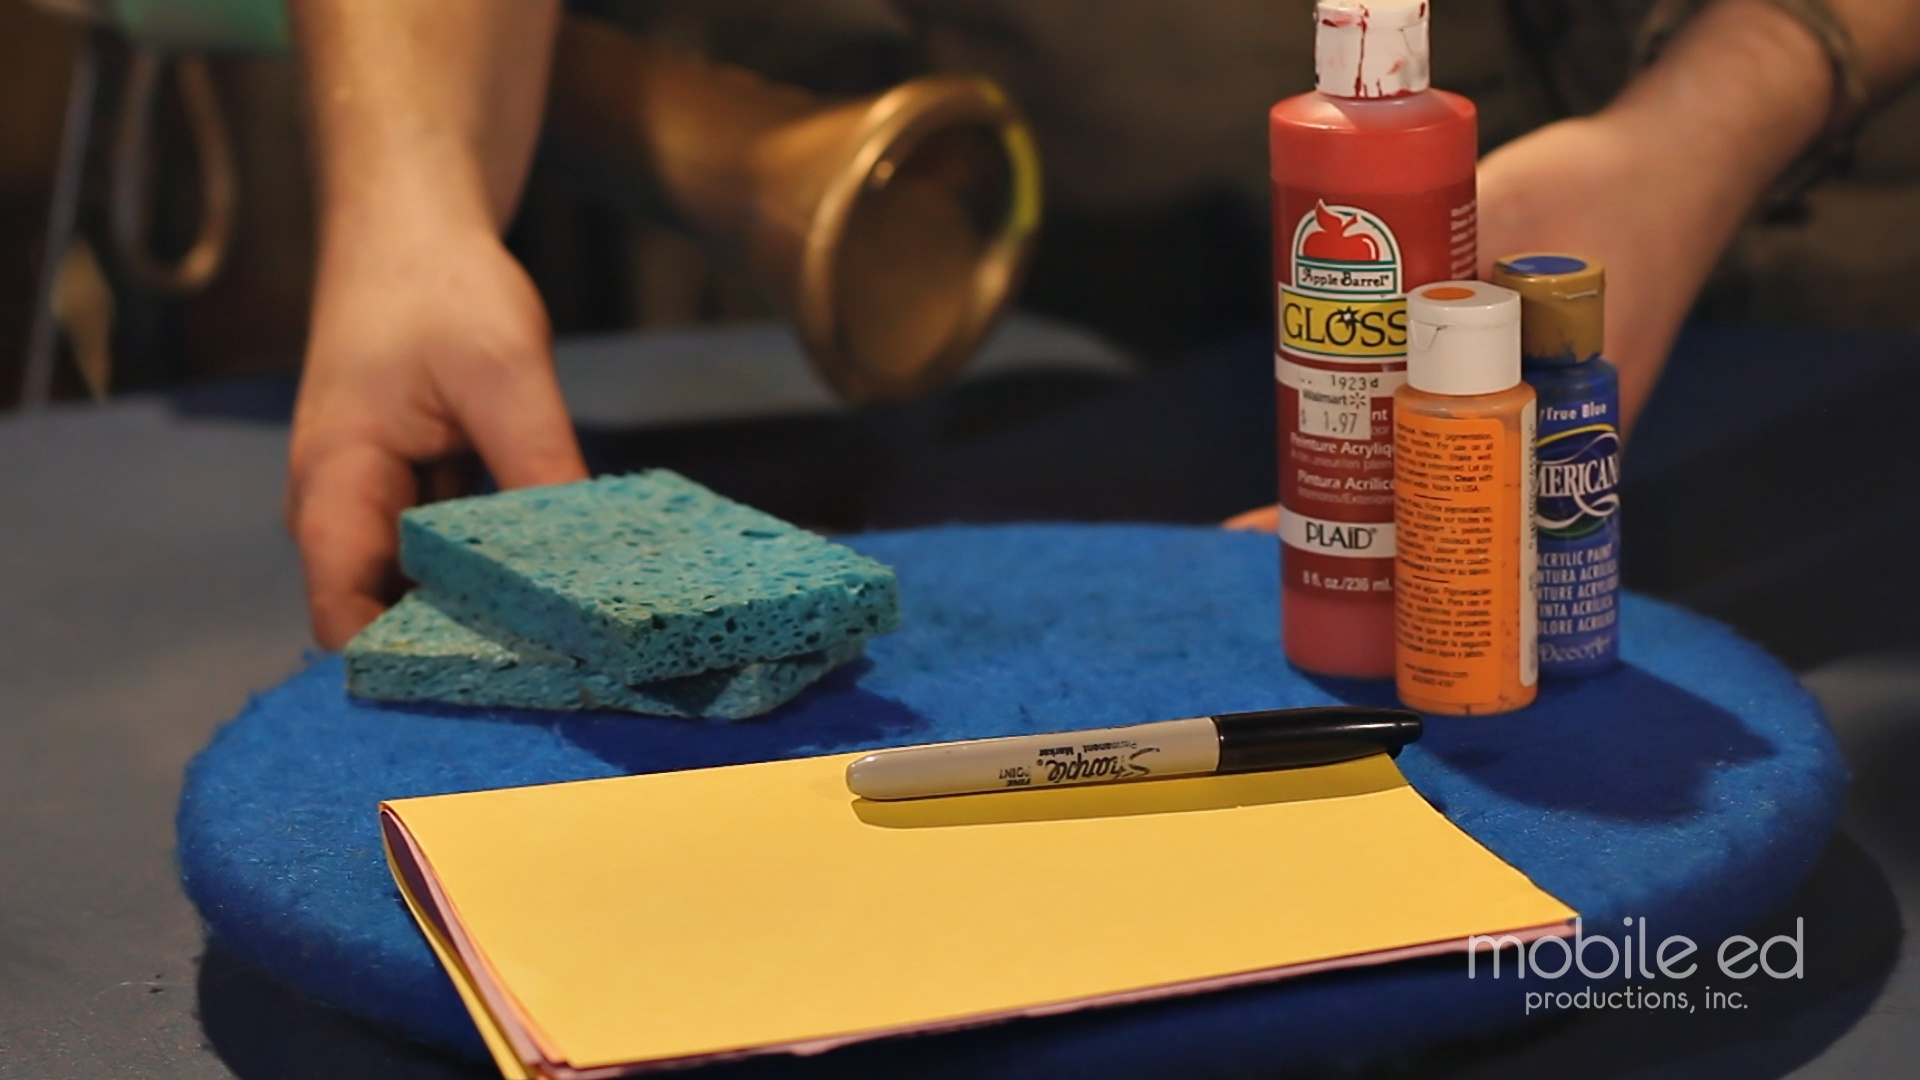 Gather Your Art Supplies | Handy Dan the Junkyard Man | Mobile Ed Productions